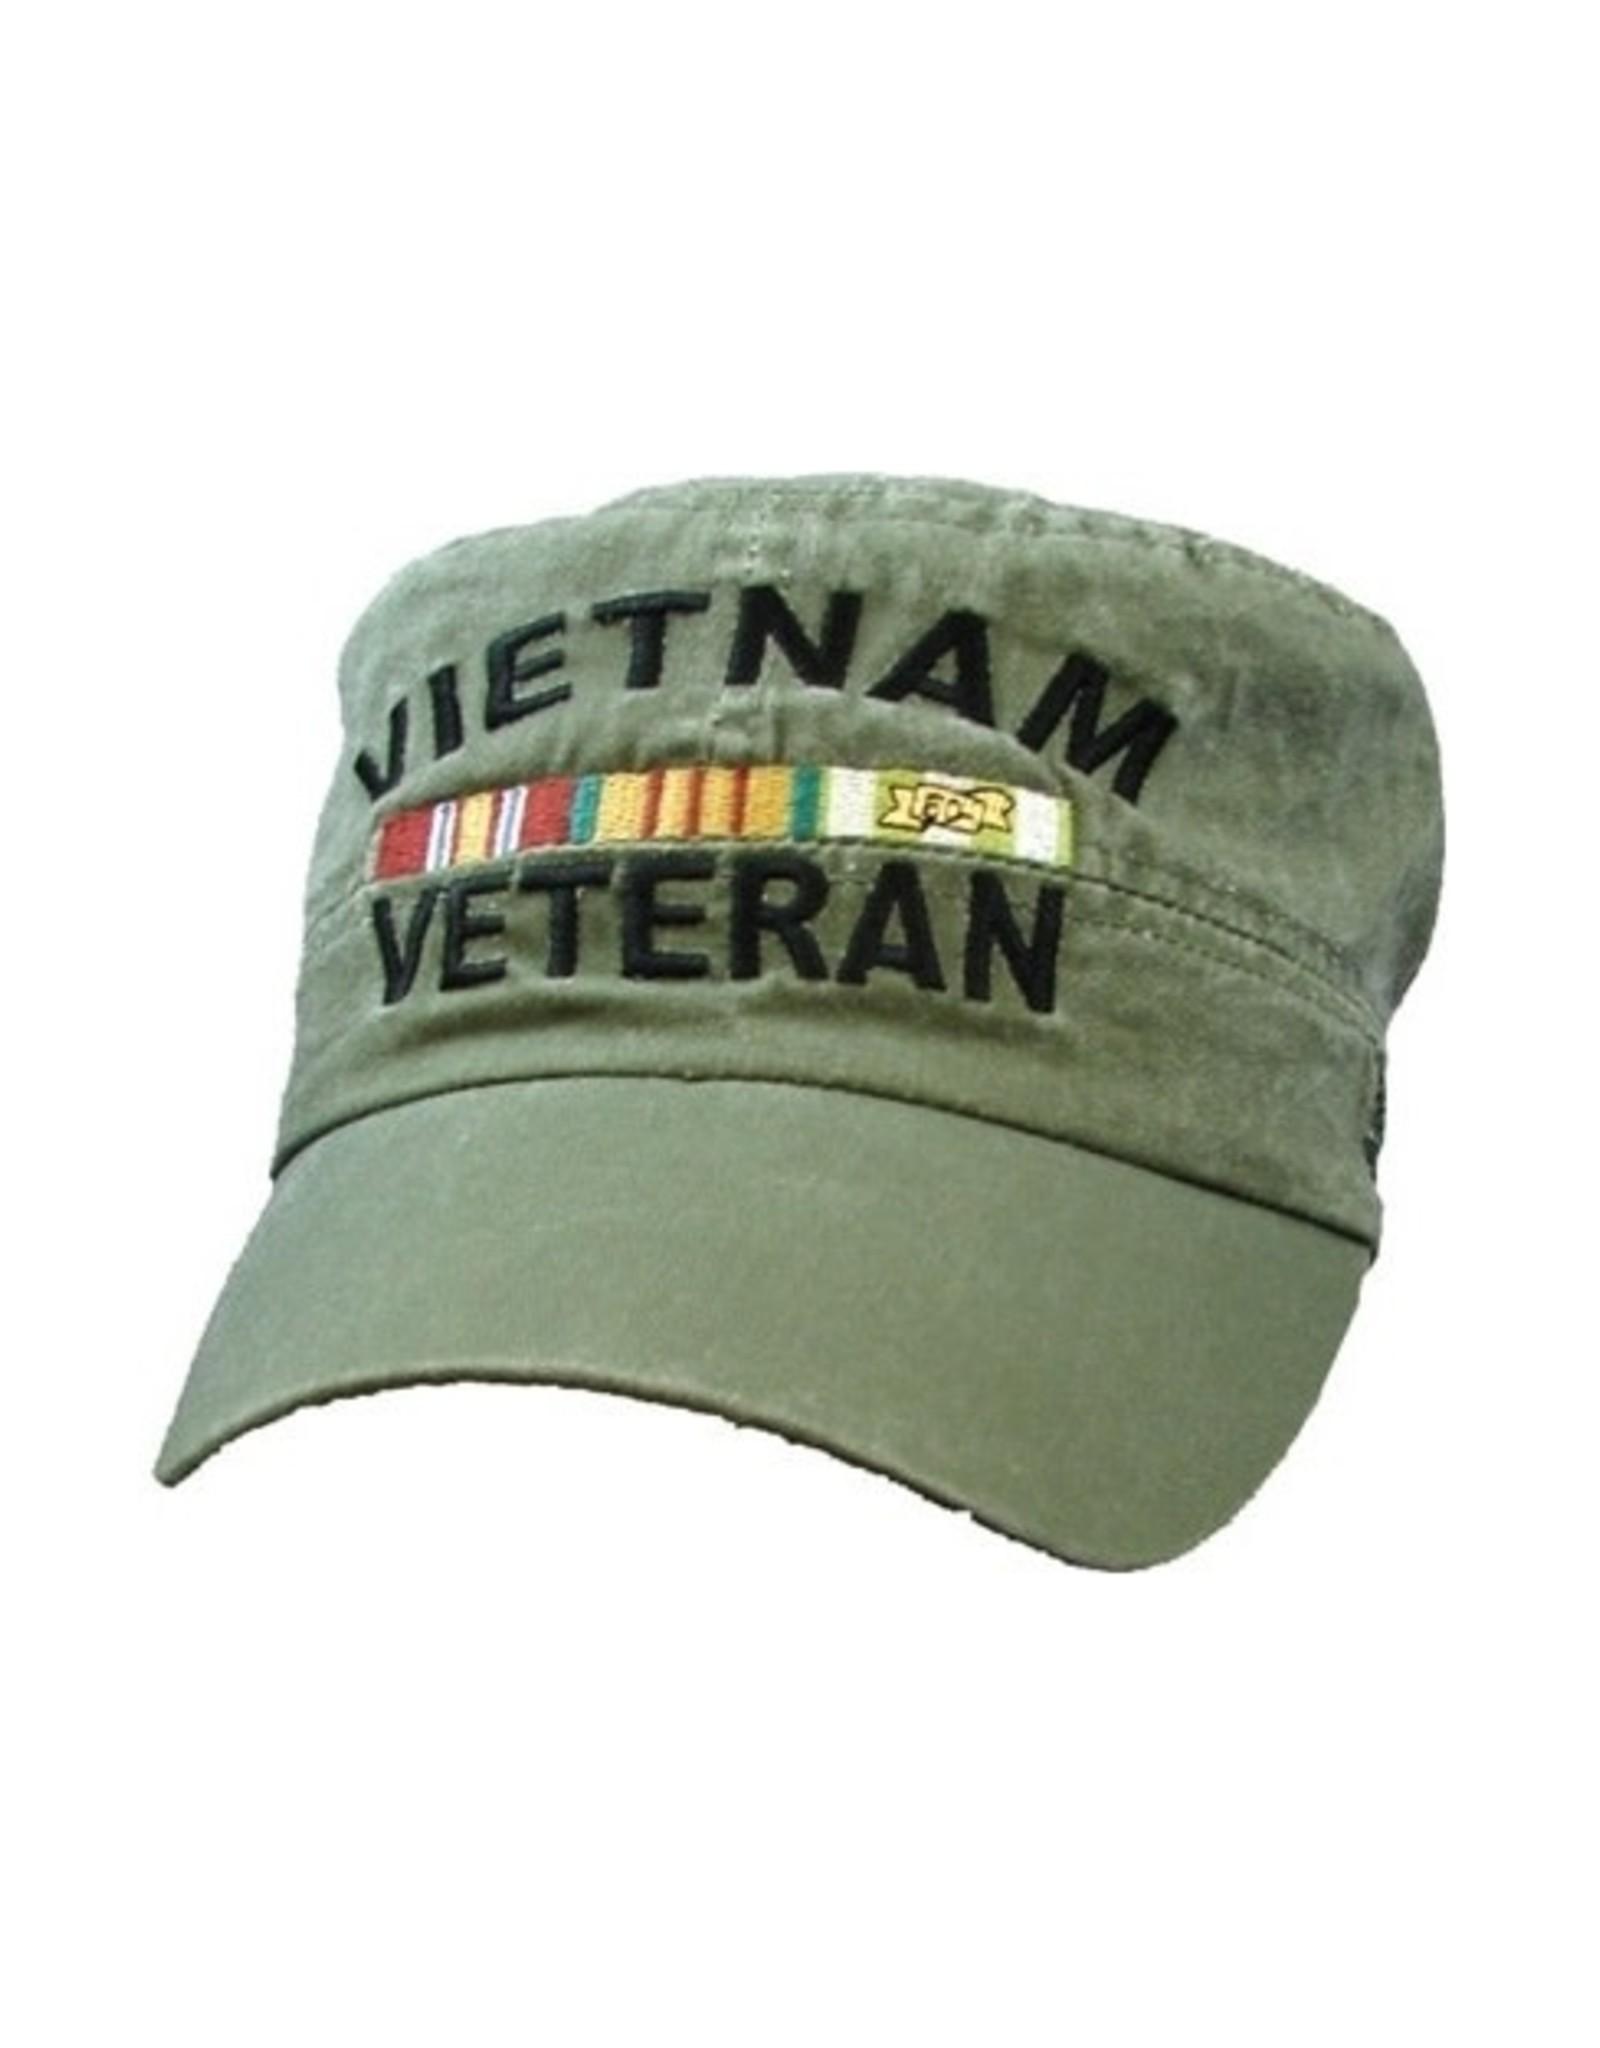 MidMil Vietnam Veteran Flat Top Hat with Ribbons Olive Drab